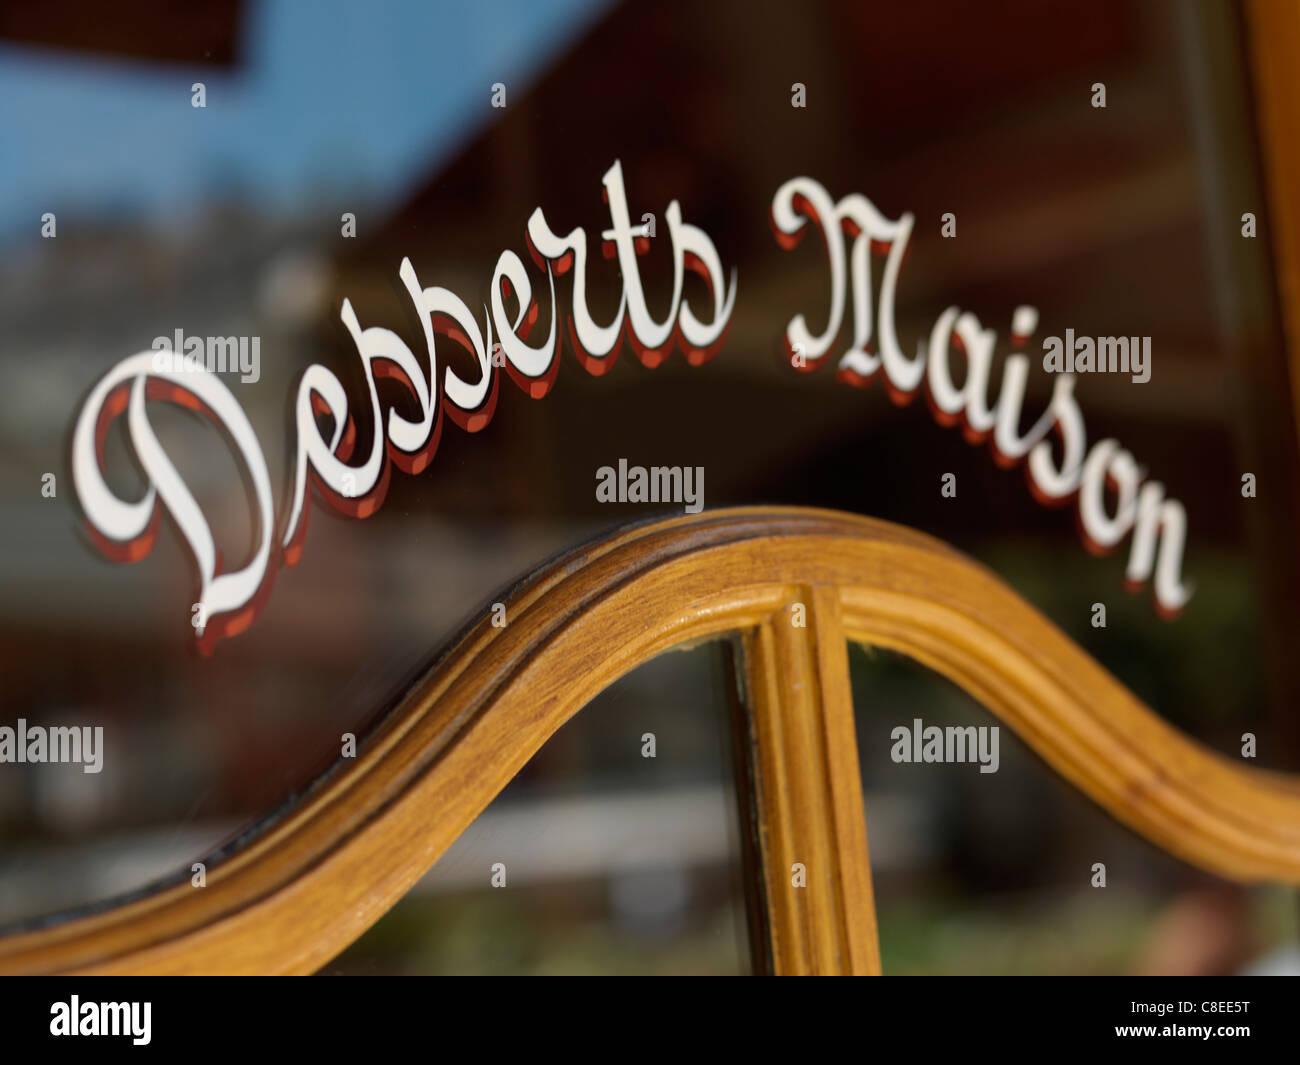 Inscription on a Bistro's window - Stock Image